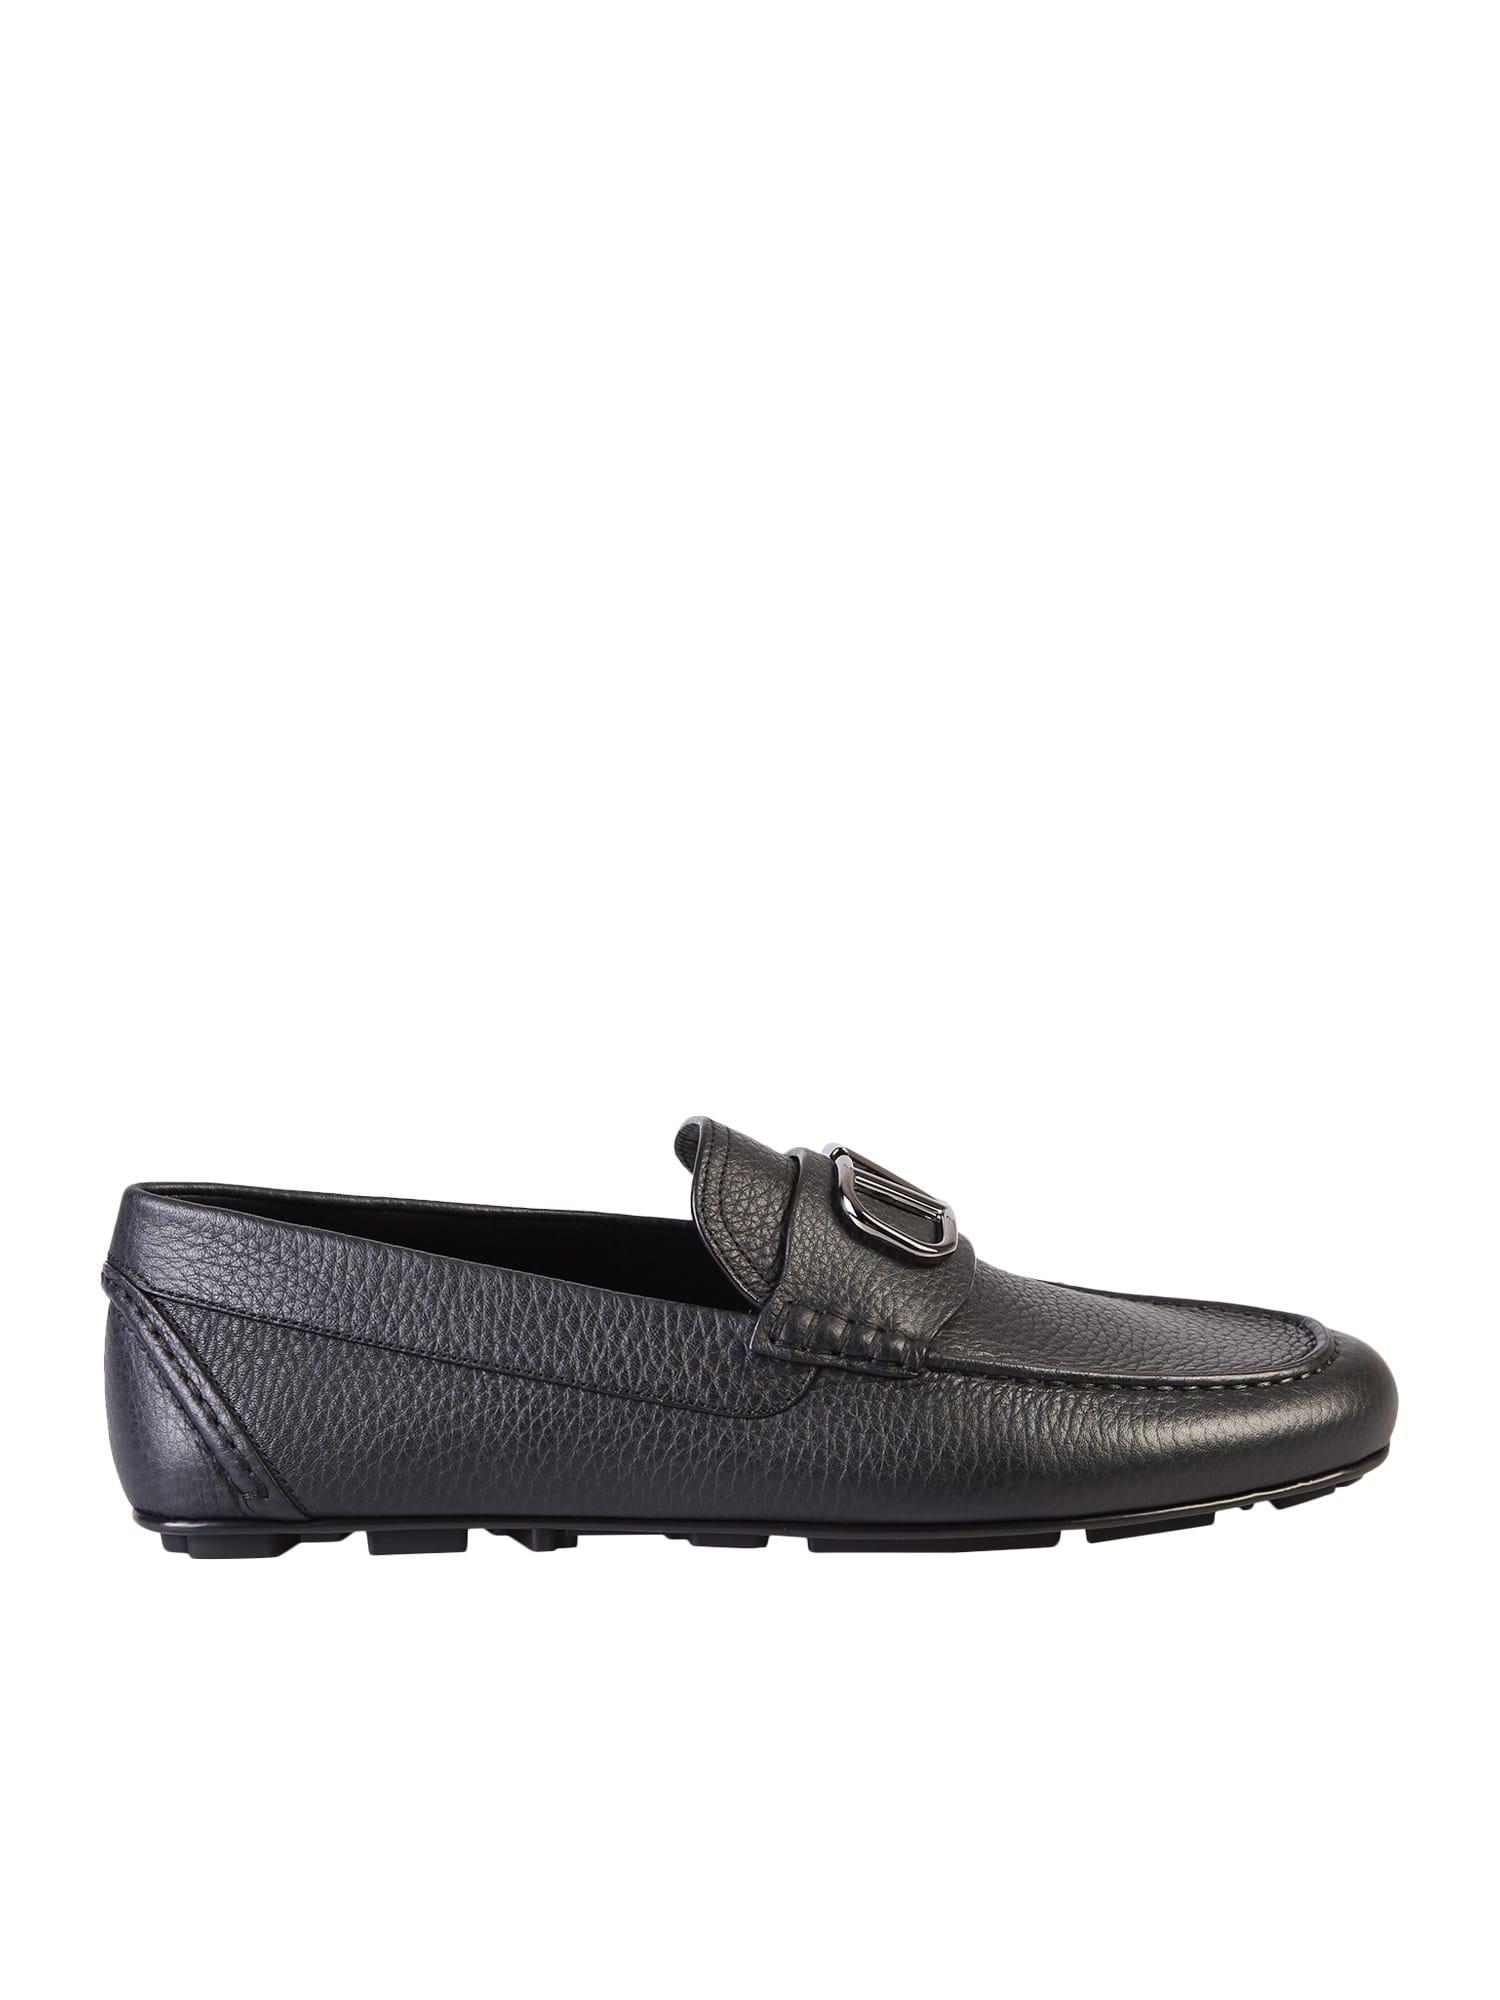 Valentino Garavani Branded Loafers